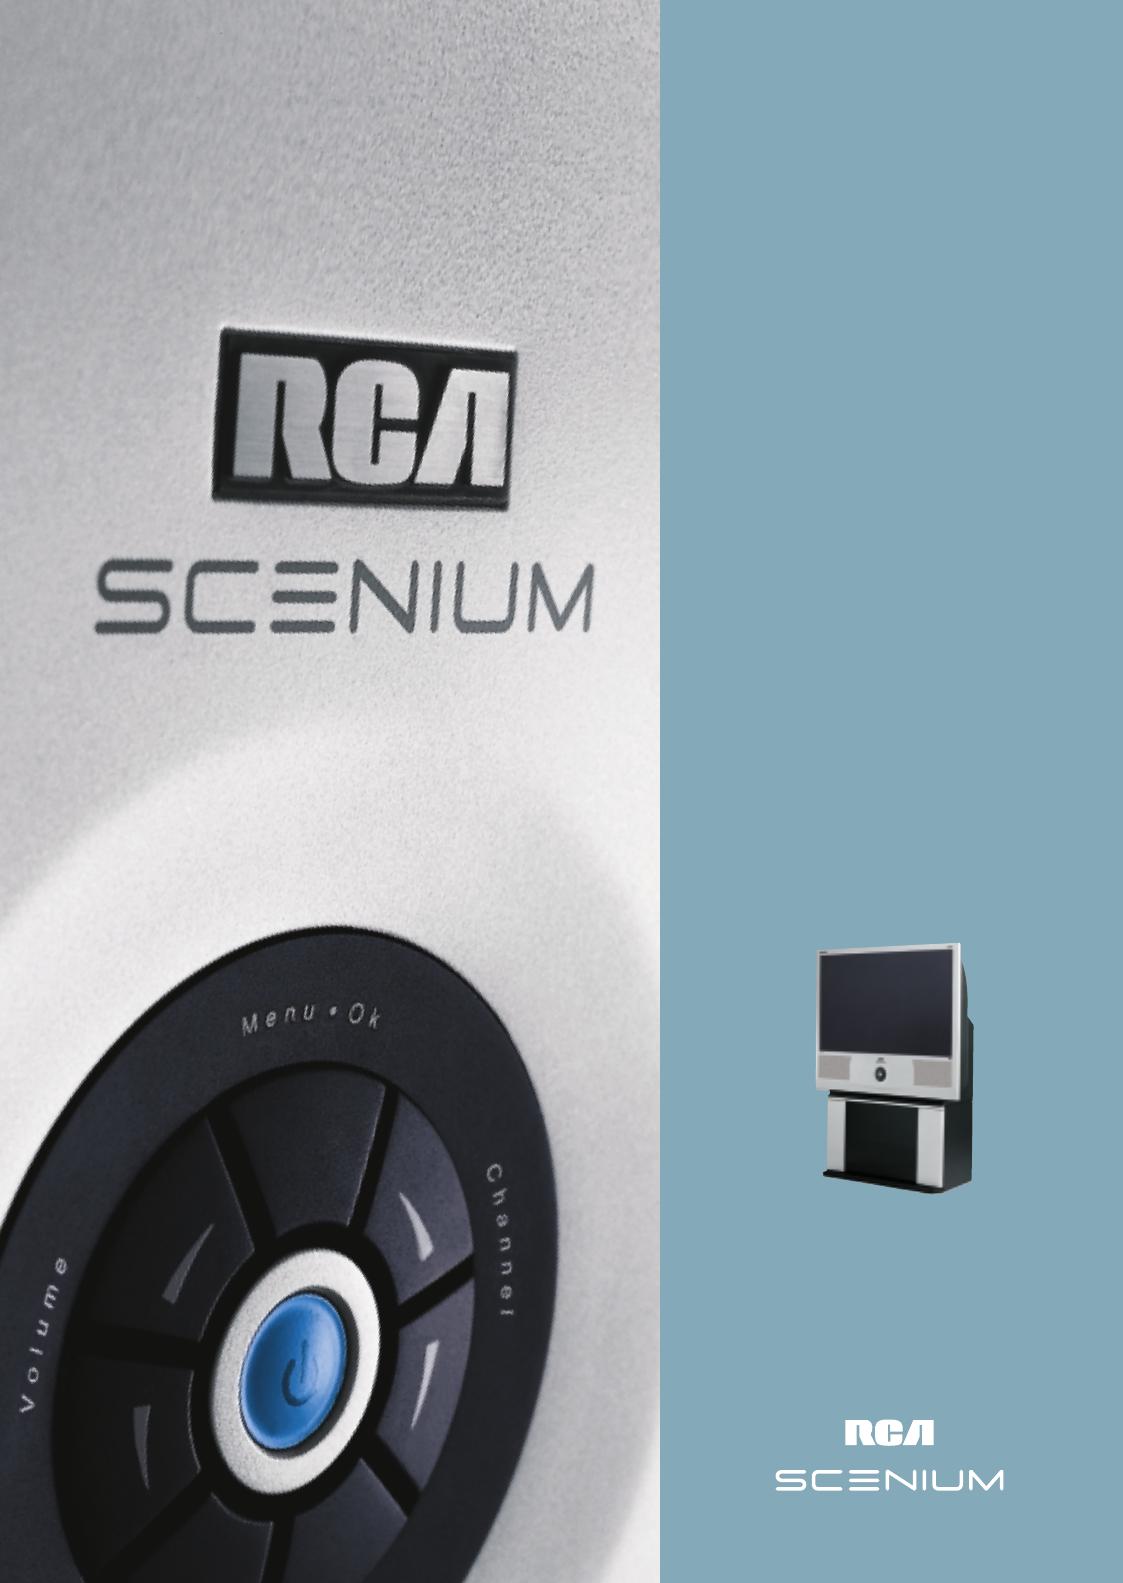 Rca Scenium L50000 Users Manual